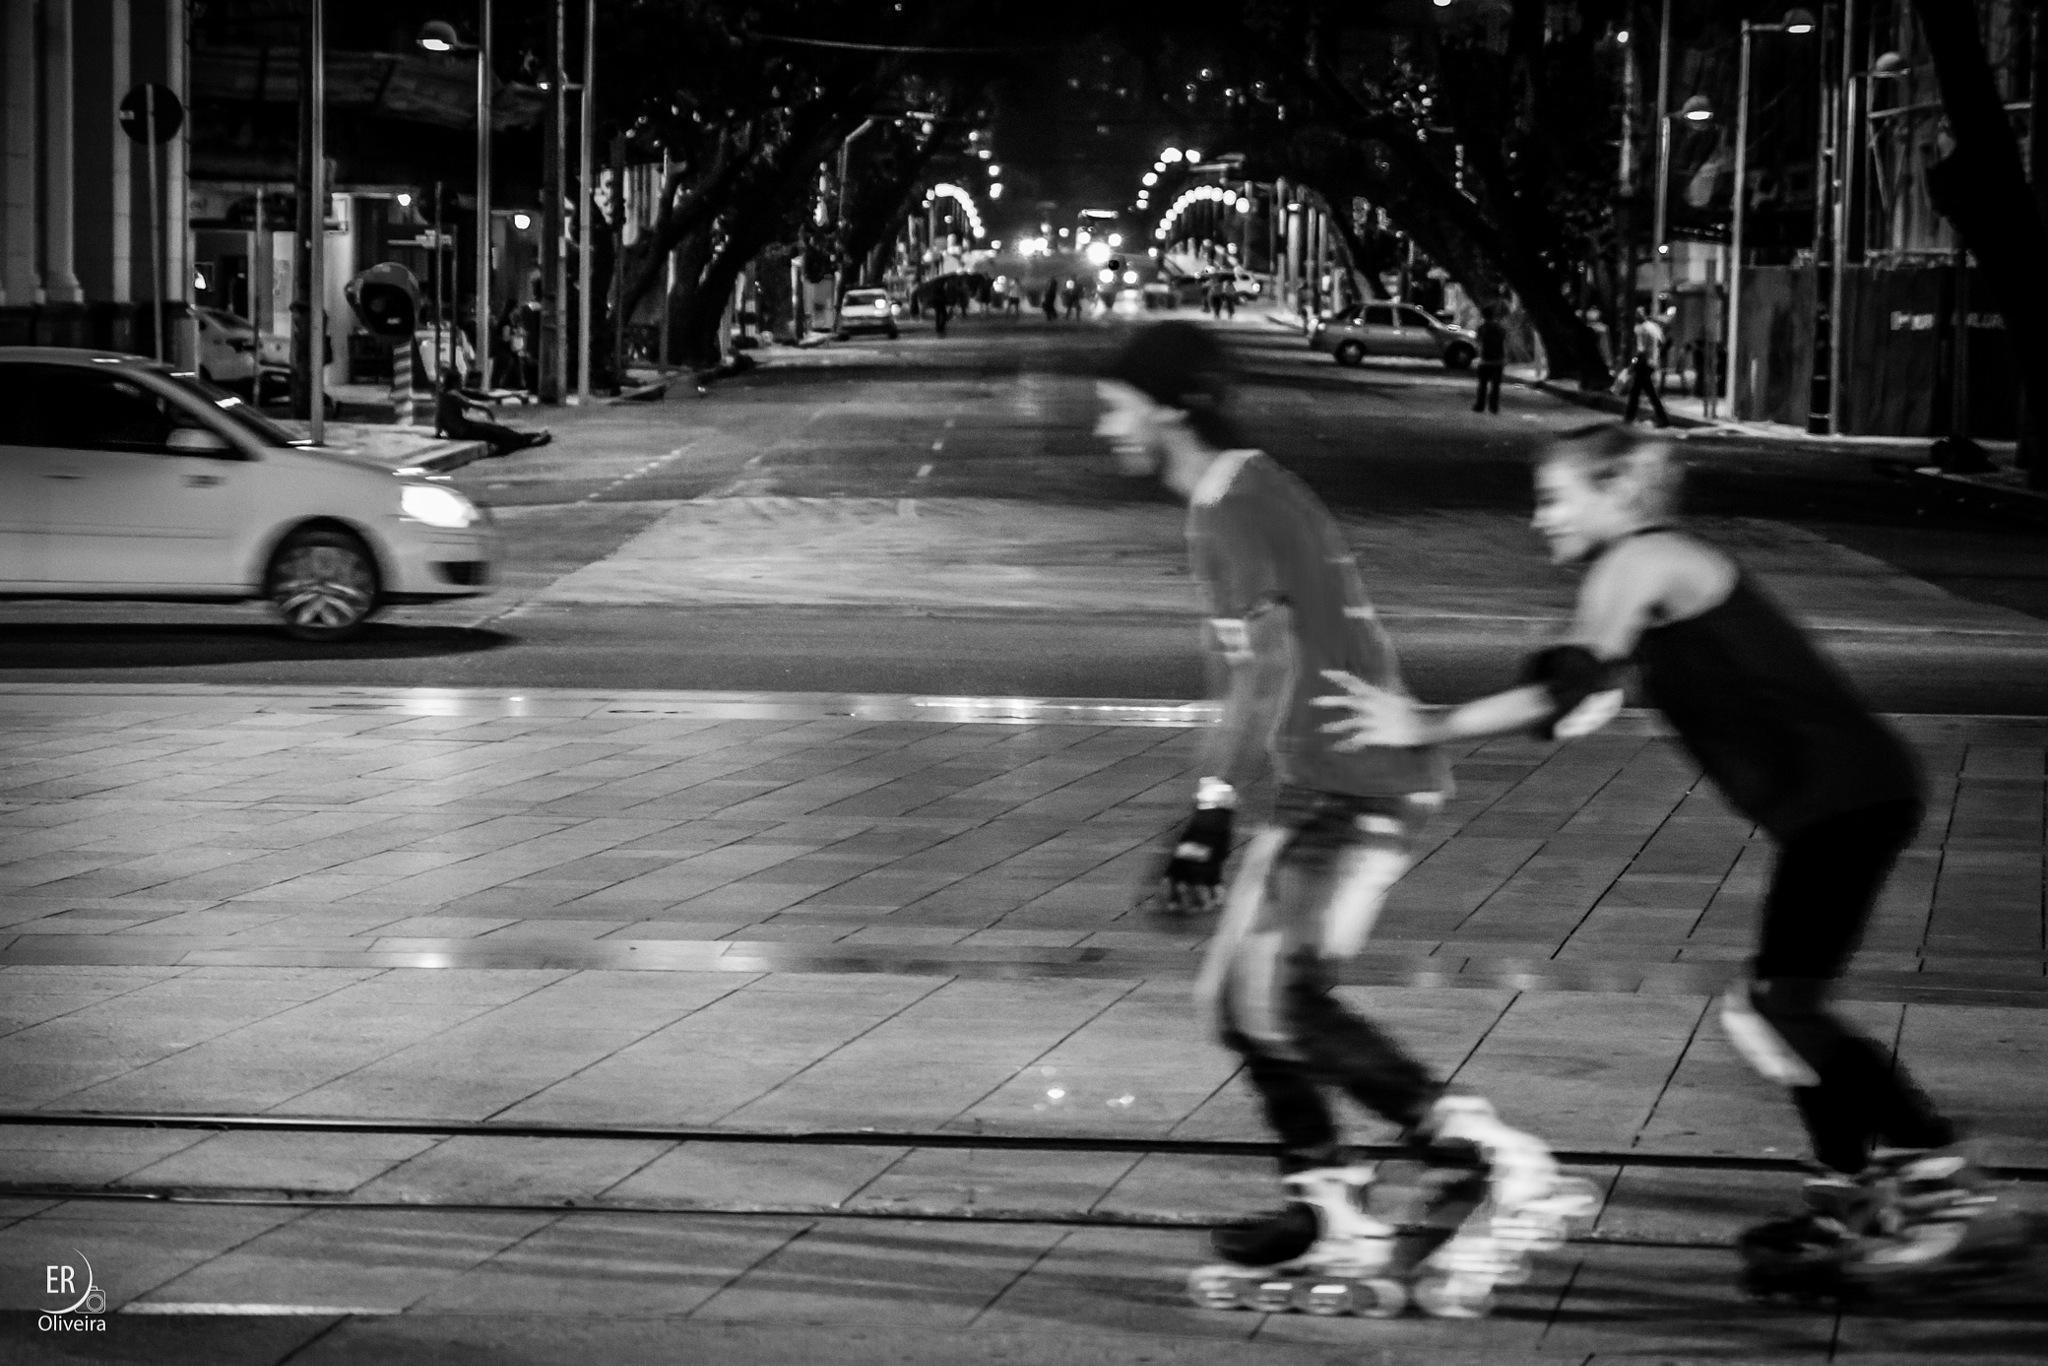 Movement by EROliveira